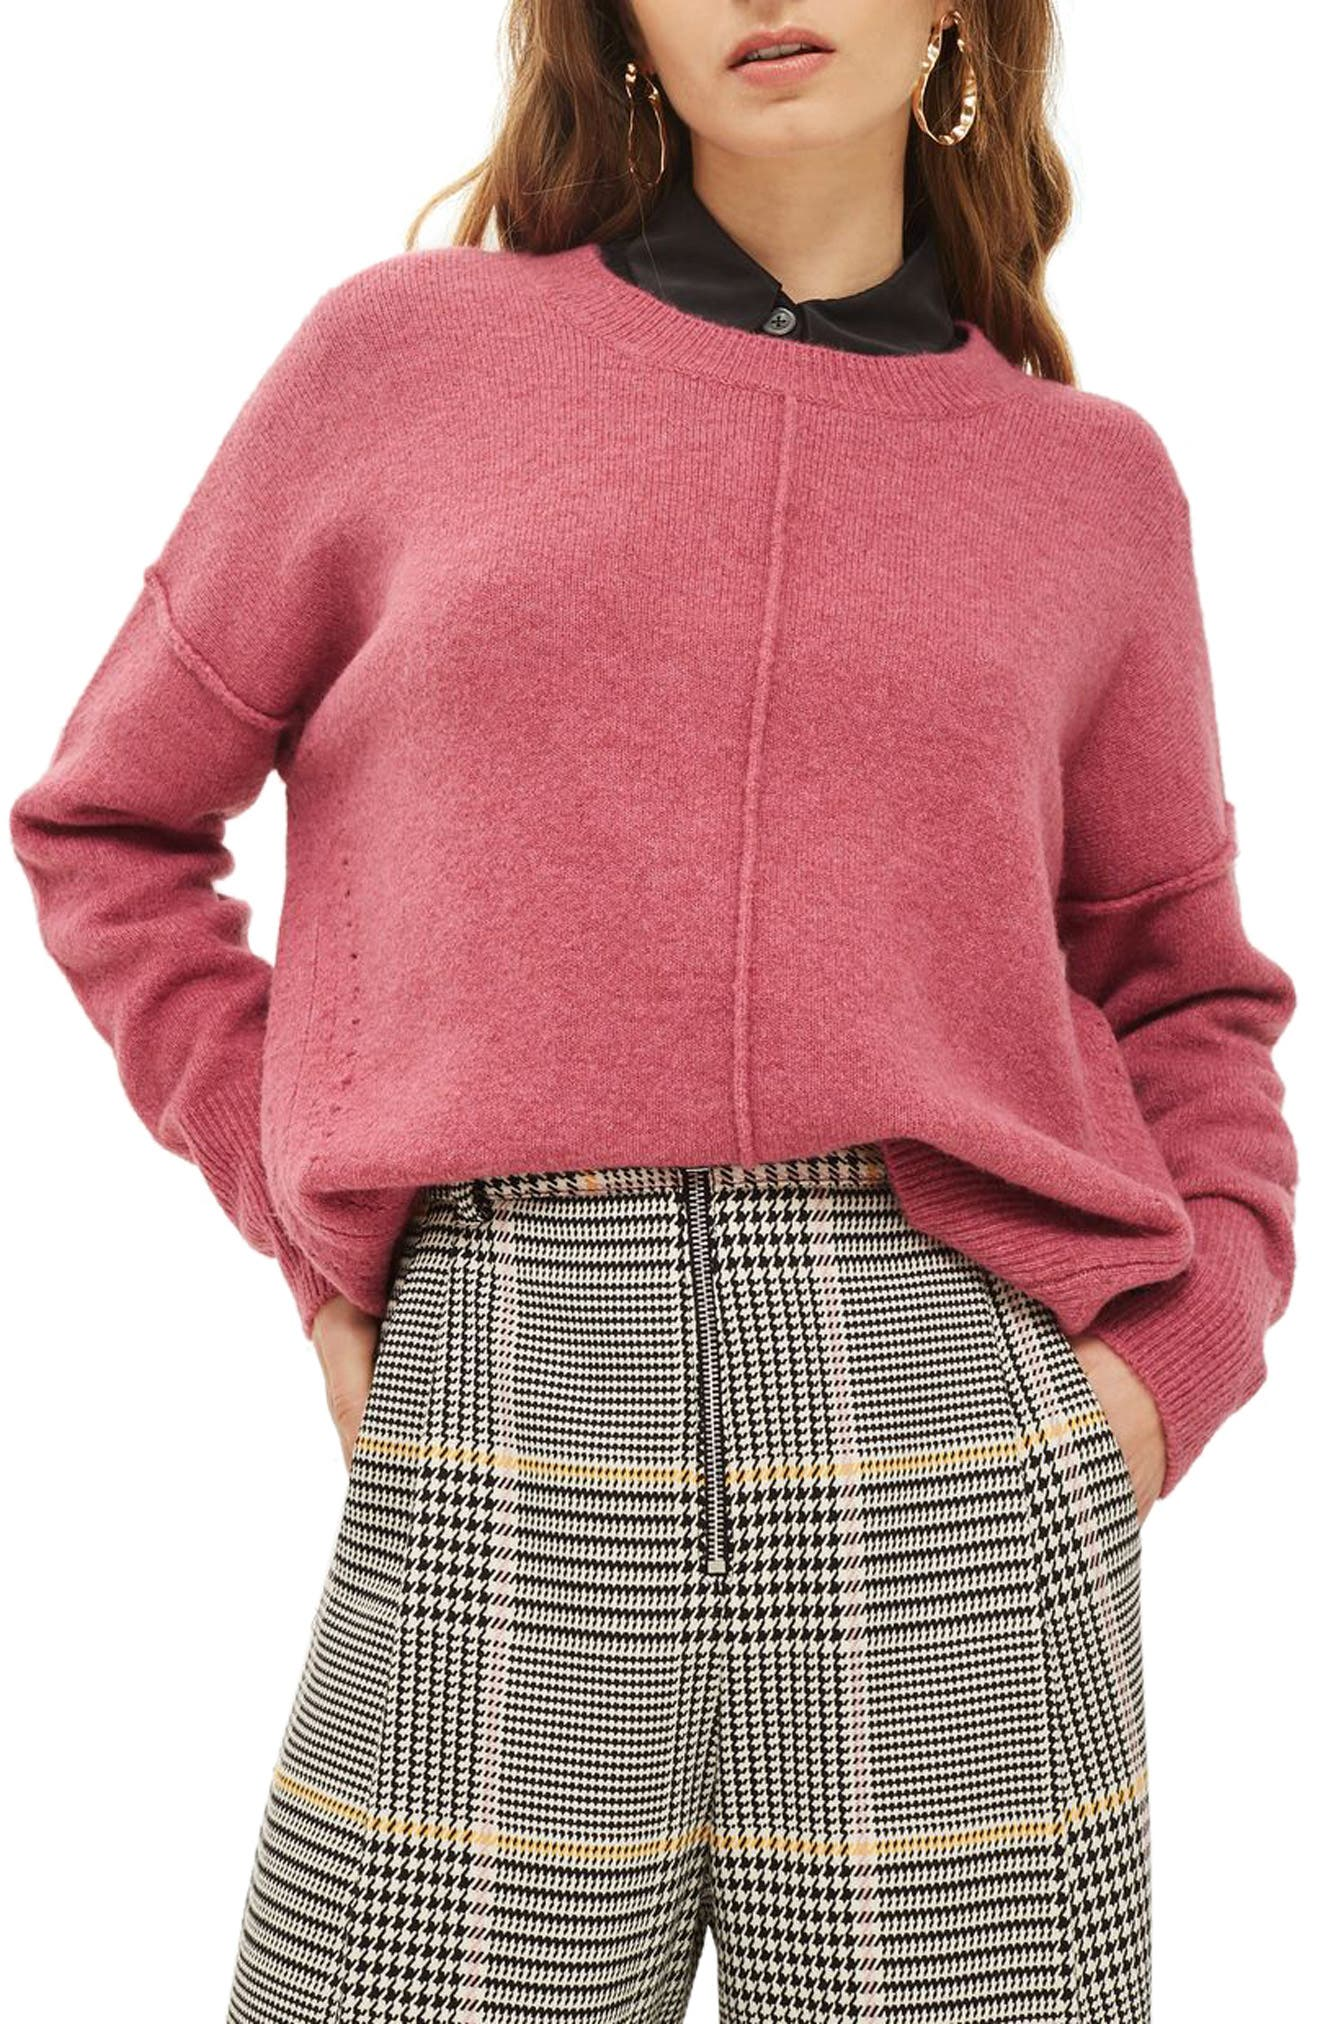 Alternate Image 1 Selected - Topshop Pointelle Detail Sweater (Regular & Petite)